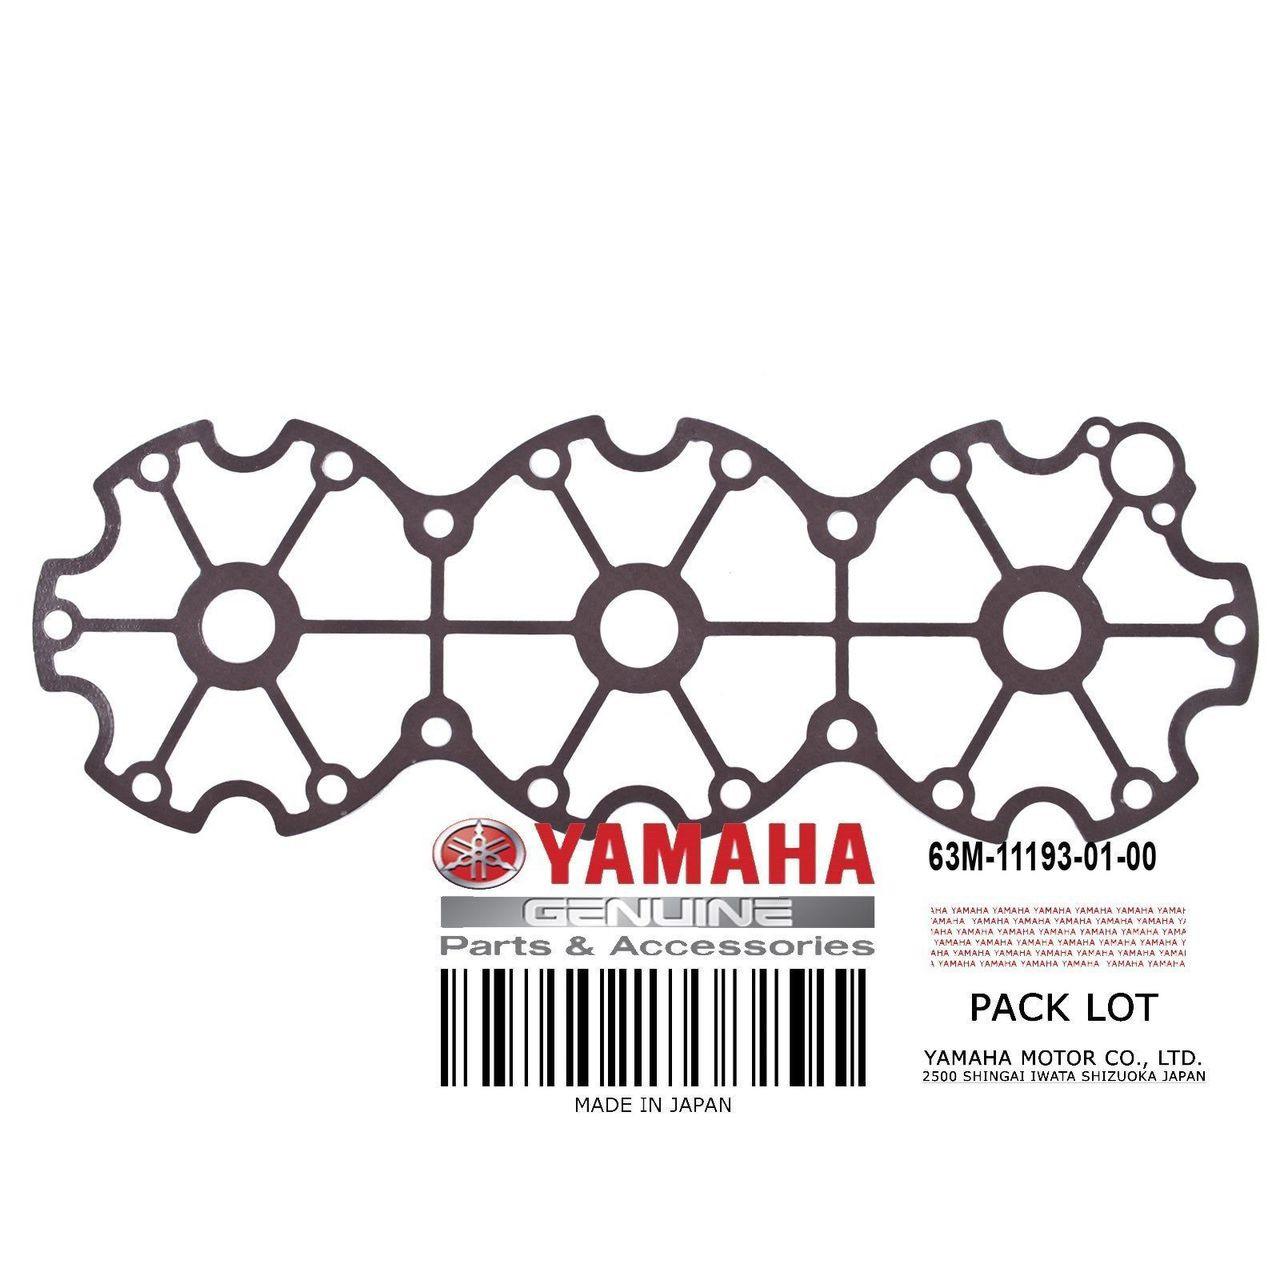 YAMAHA OEM Head Cover Gasket 63M-11193-01-00 1995-2005 GP